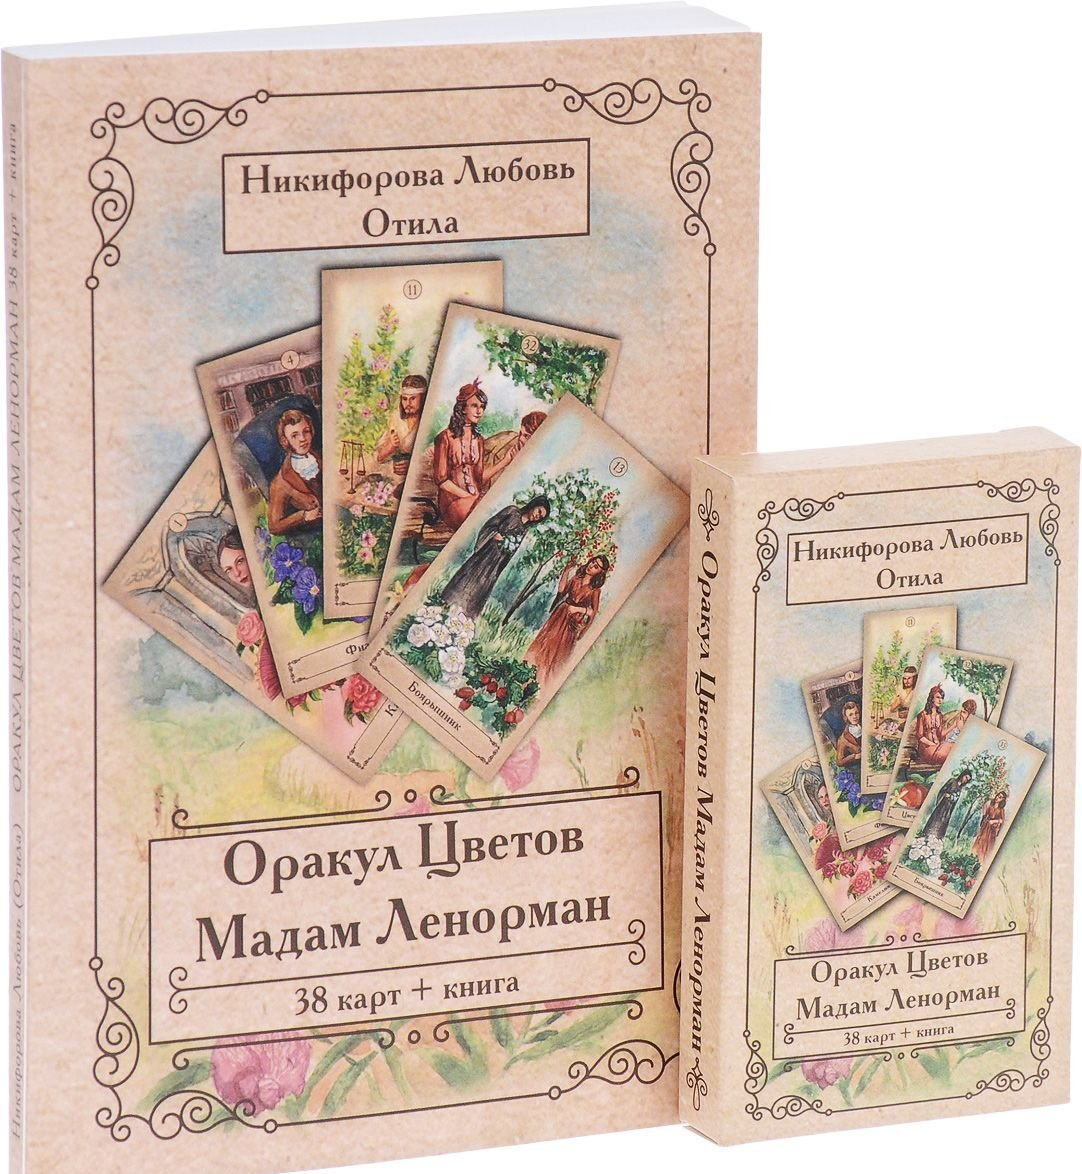 Oracle of Flowers Madame Lenorman Russian Book + 38 Tarot card OTILA Nikiforova